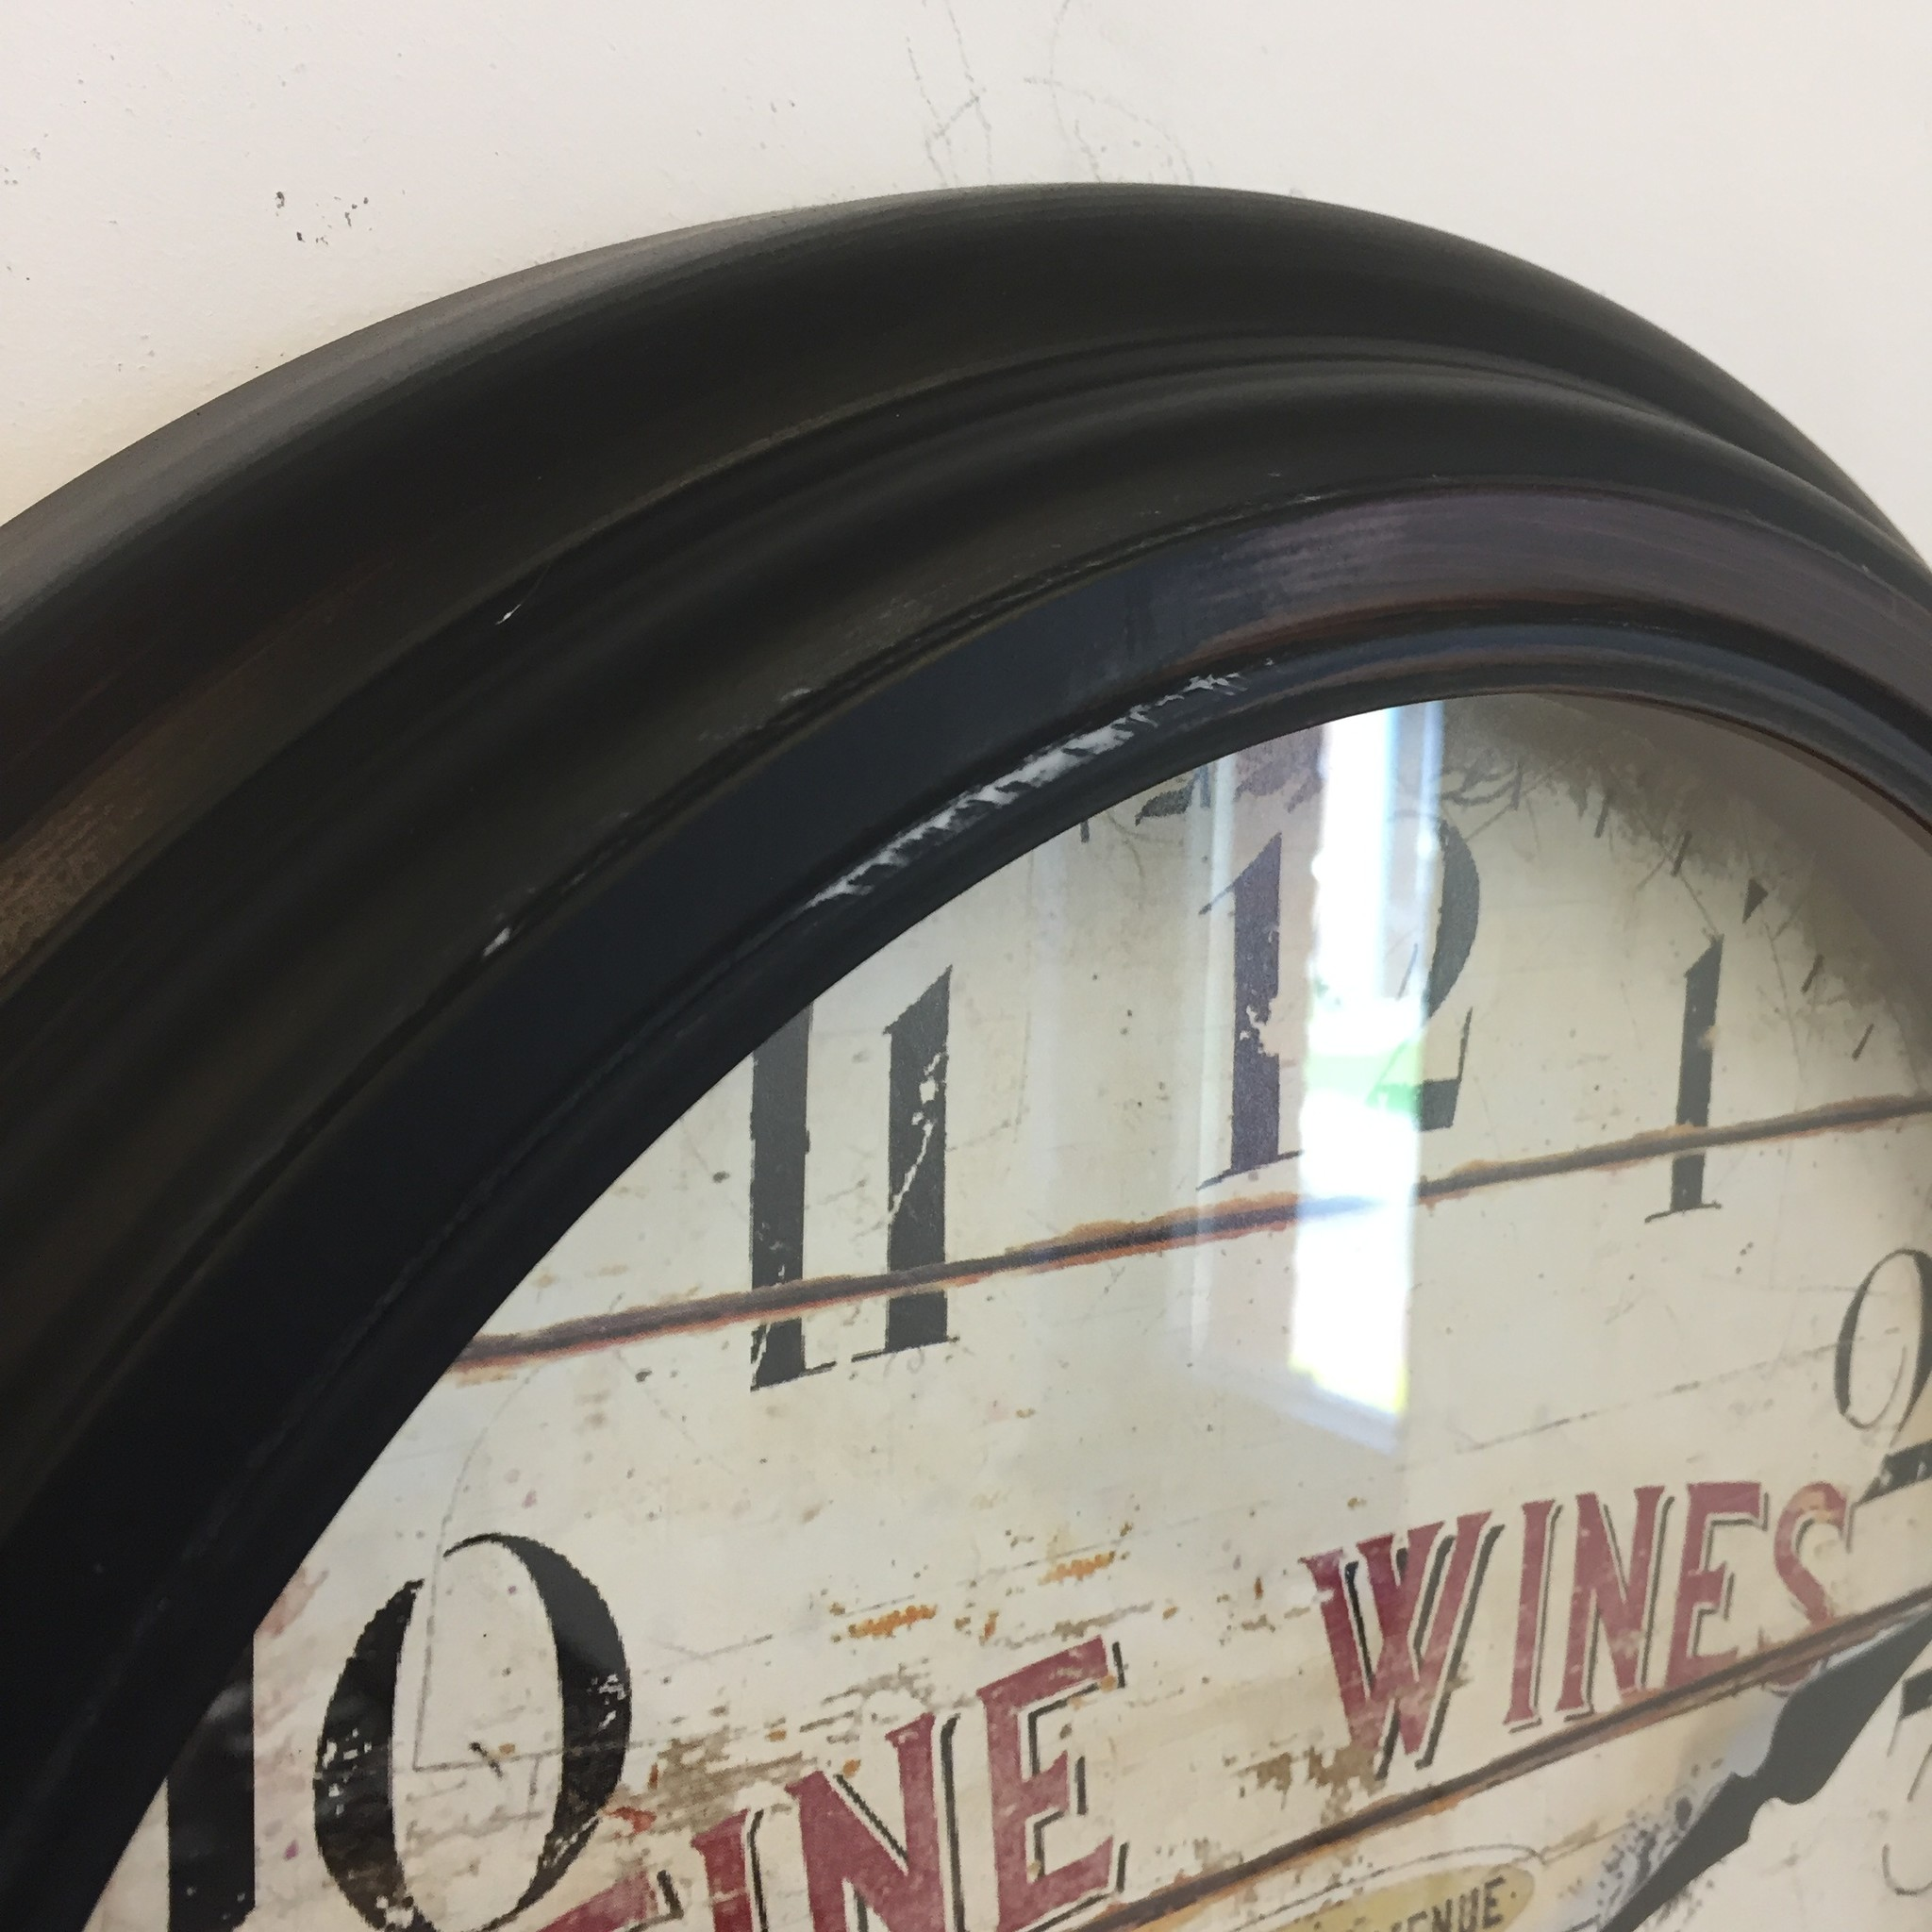 NiceTime Wandklok Fine Wines industrieel retro vintage